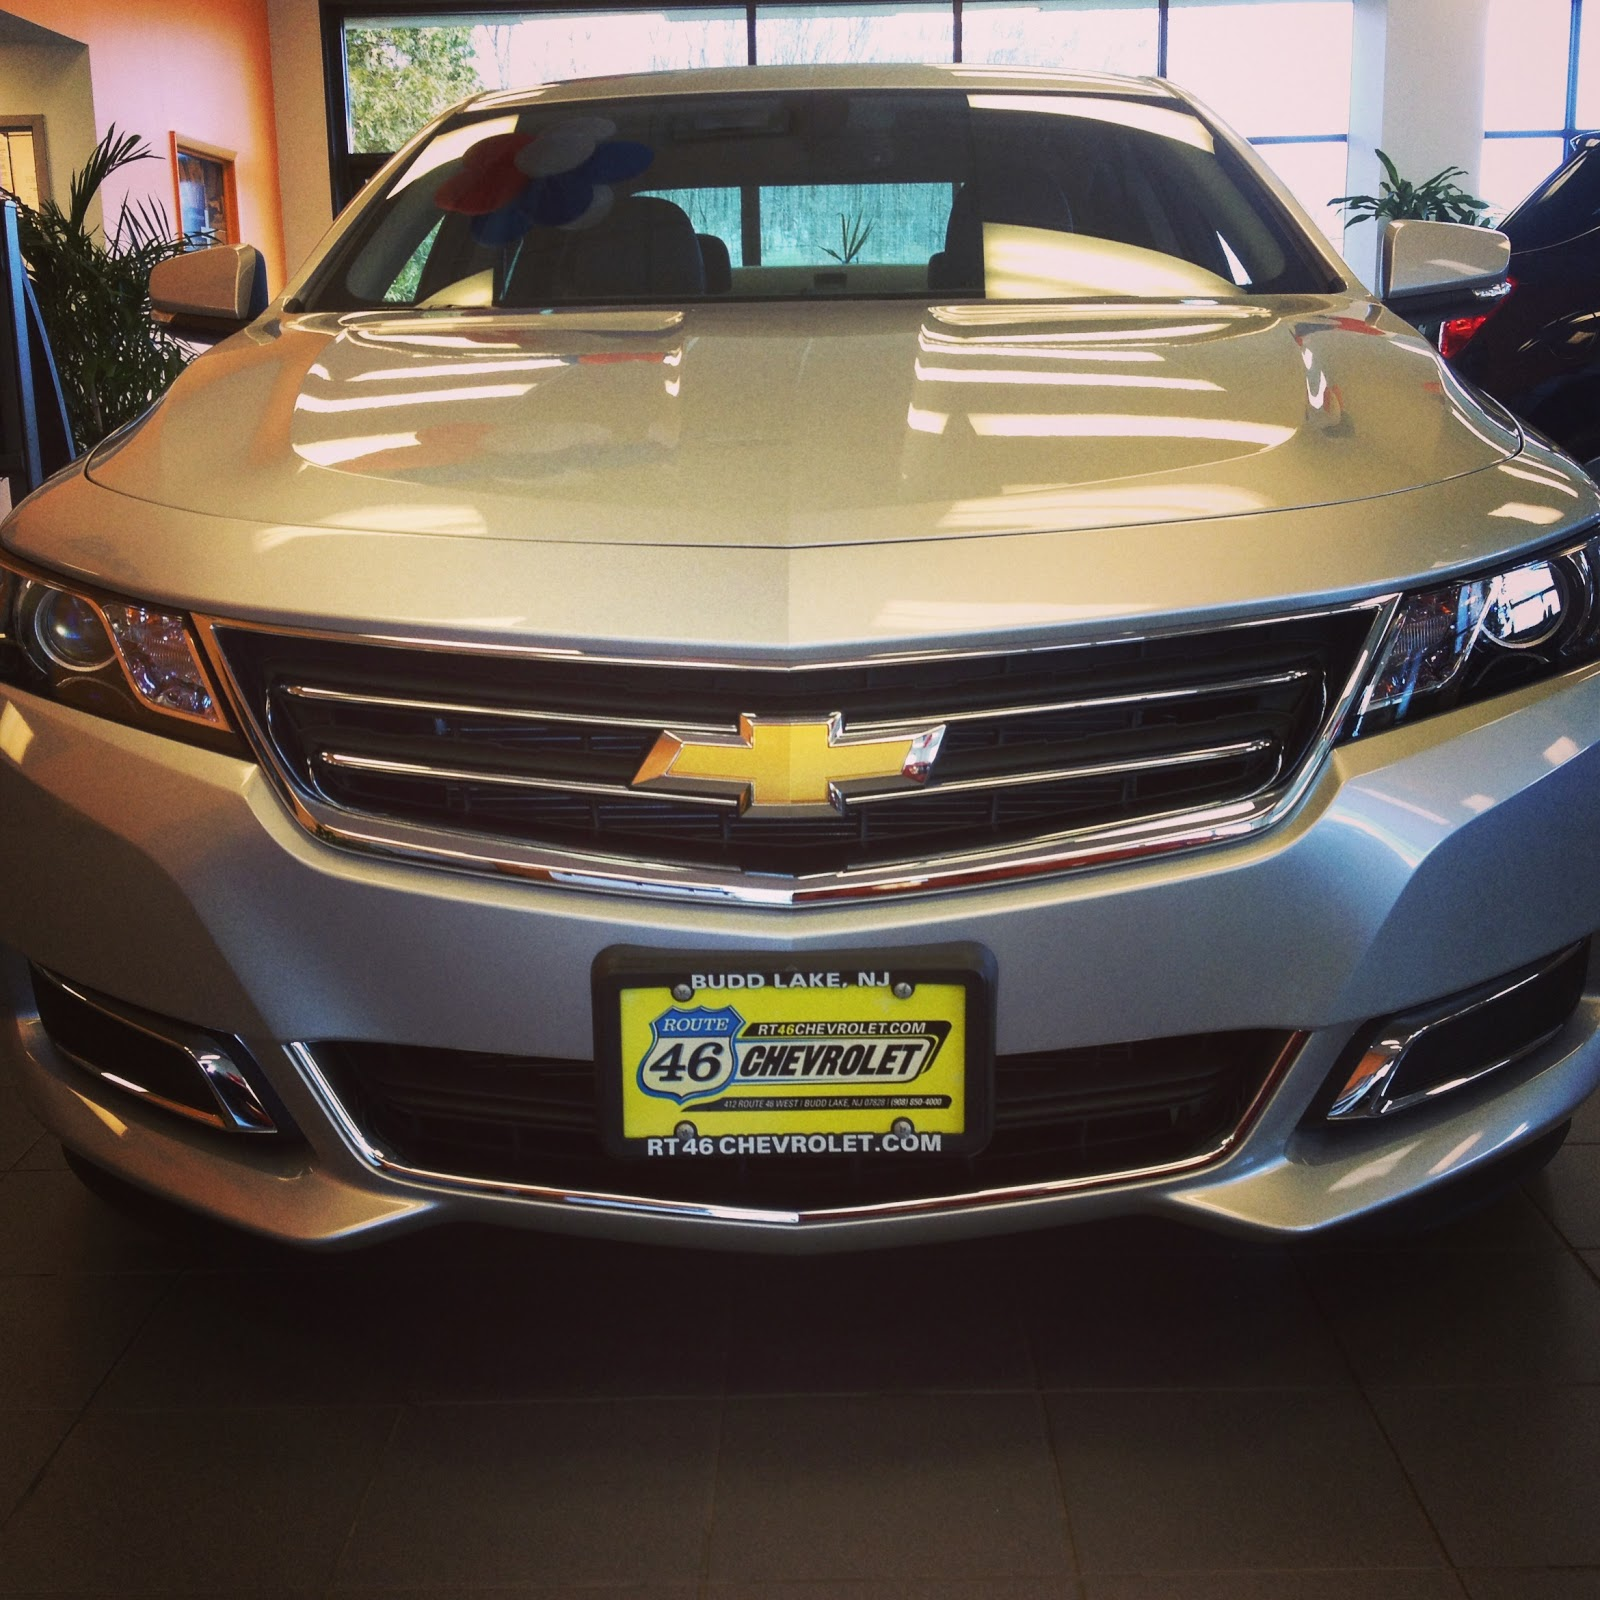 Route 46 Chevrolet: 2014 Chevy Impala